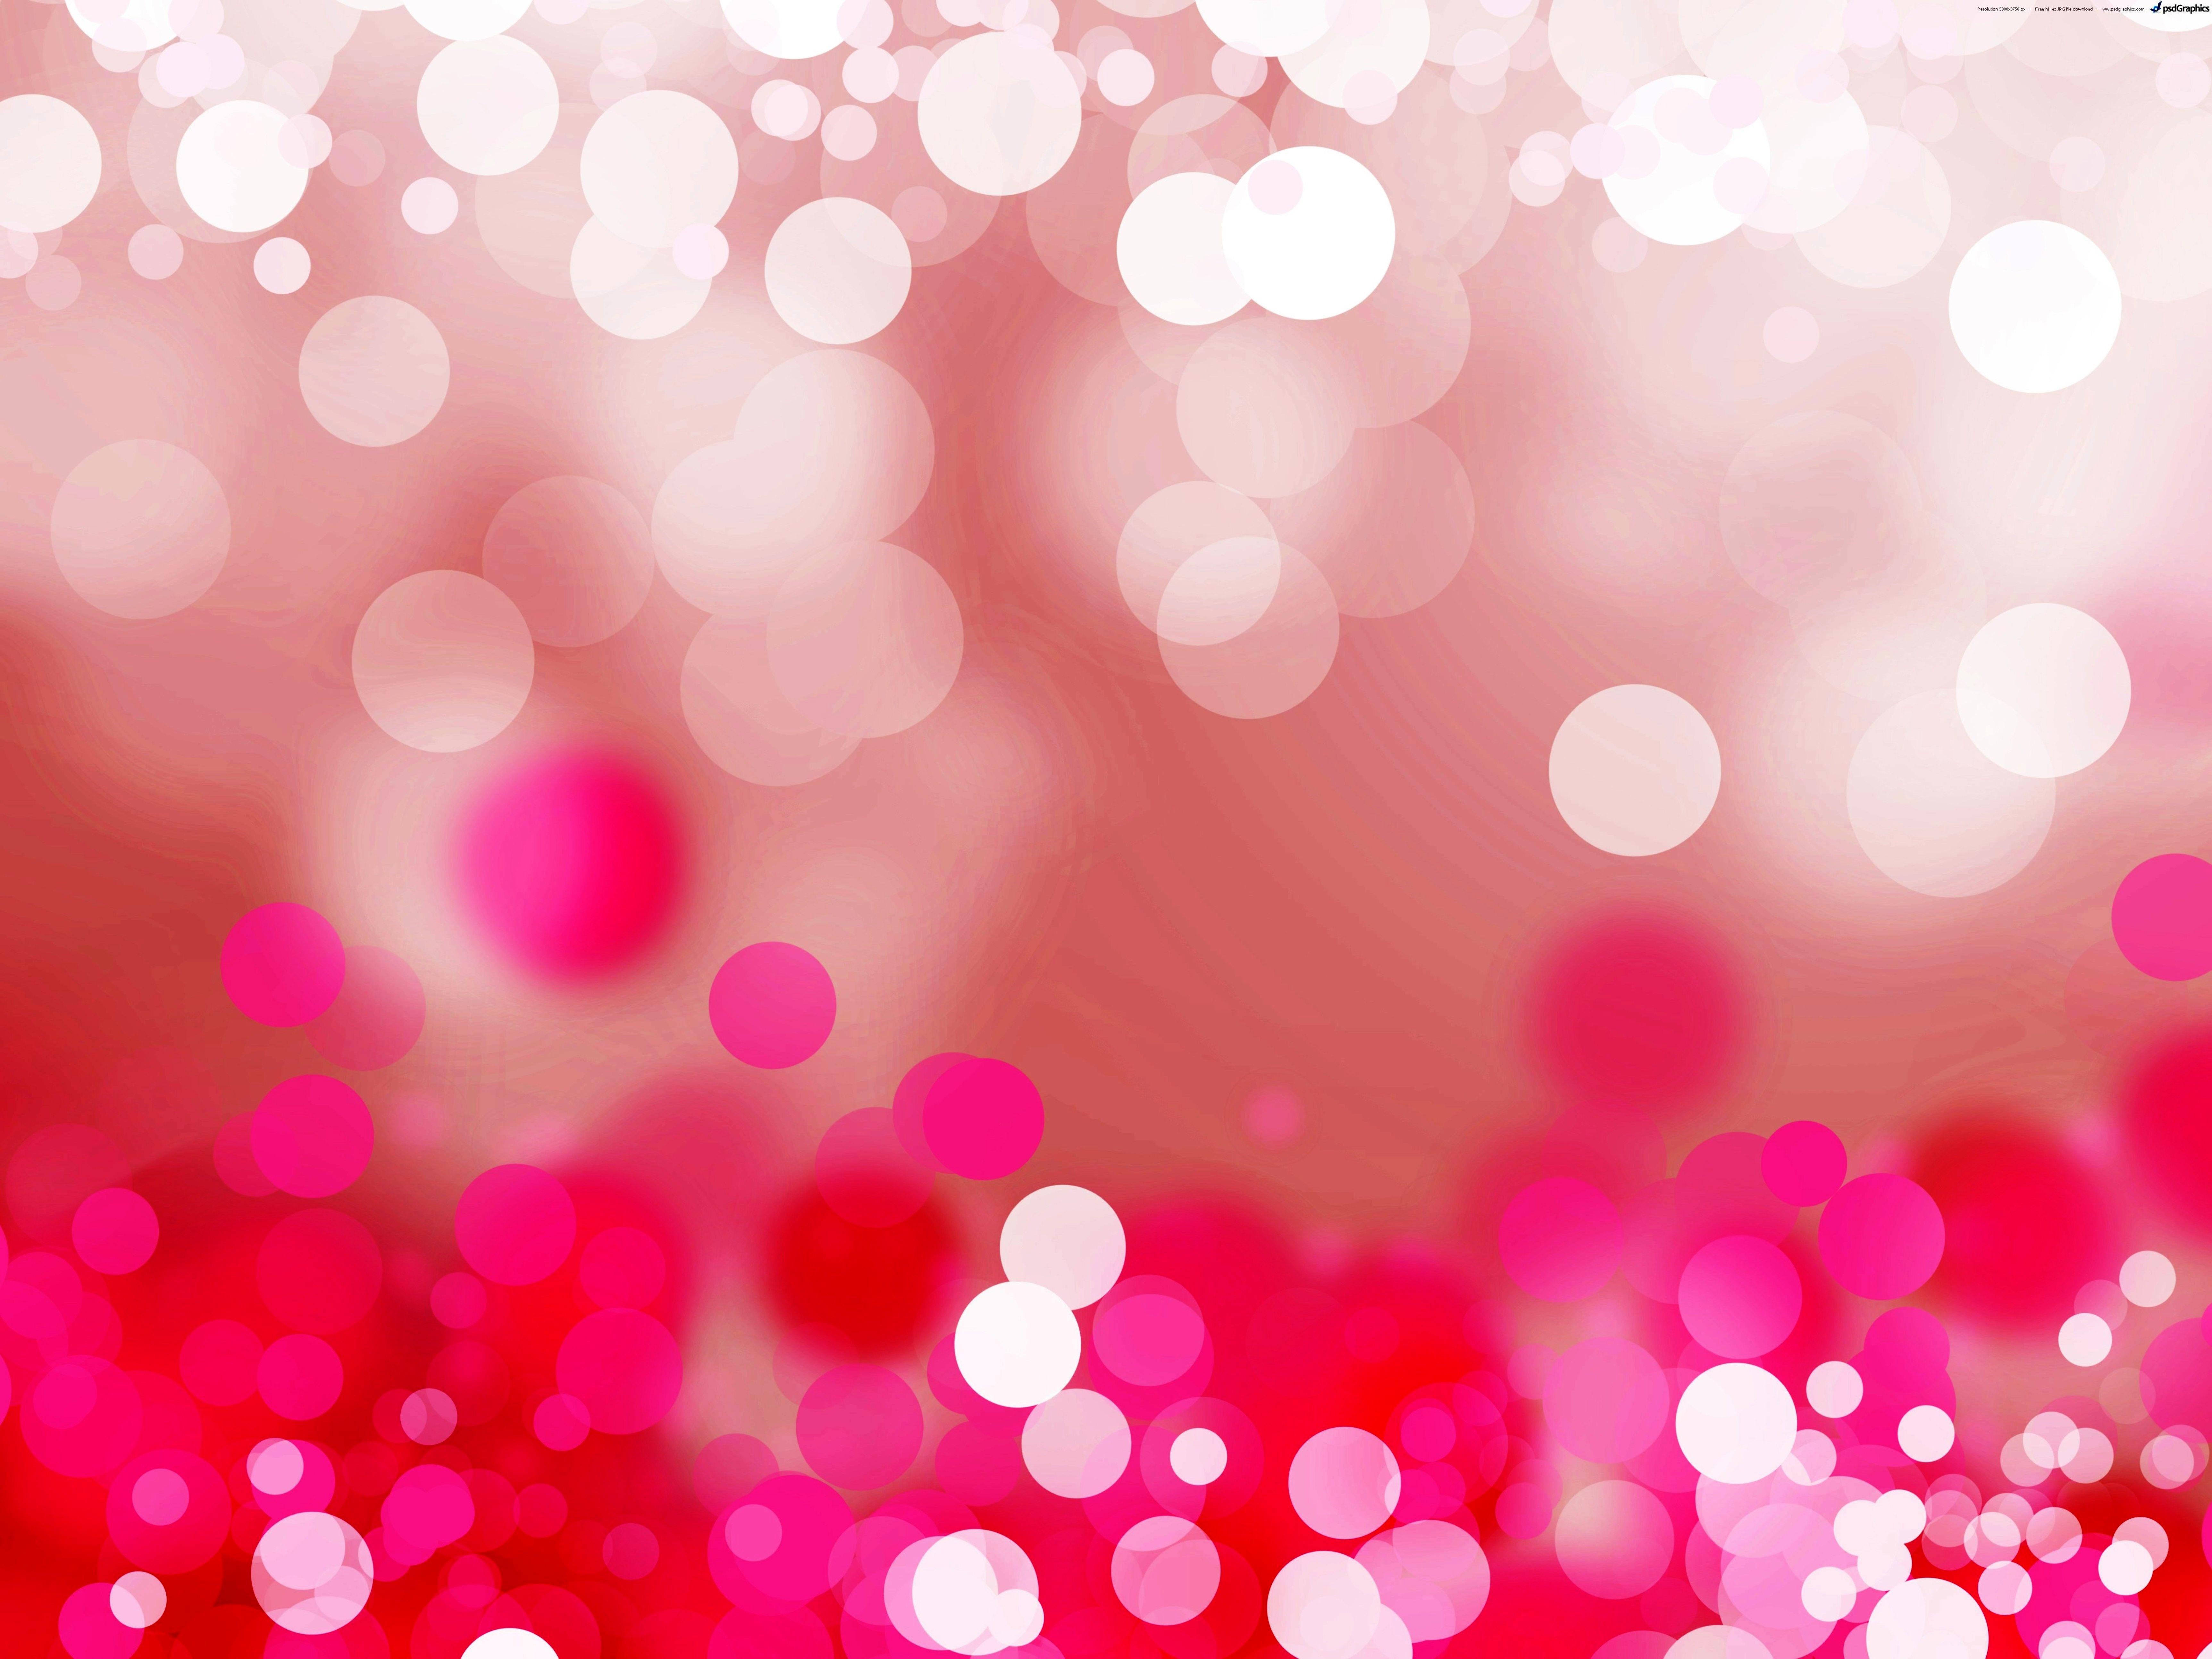 Pretty Girly Colorful Wallpapers WeNeedFun 6900x5175